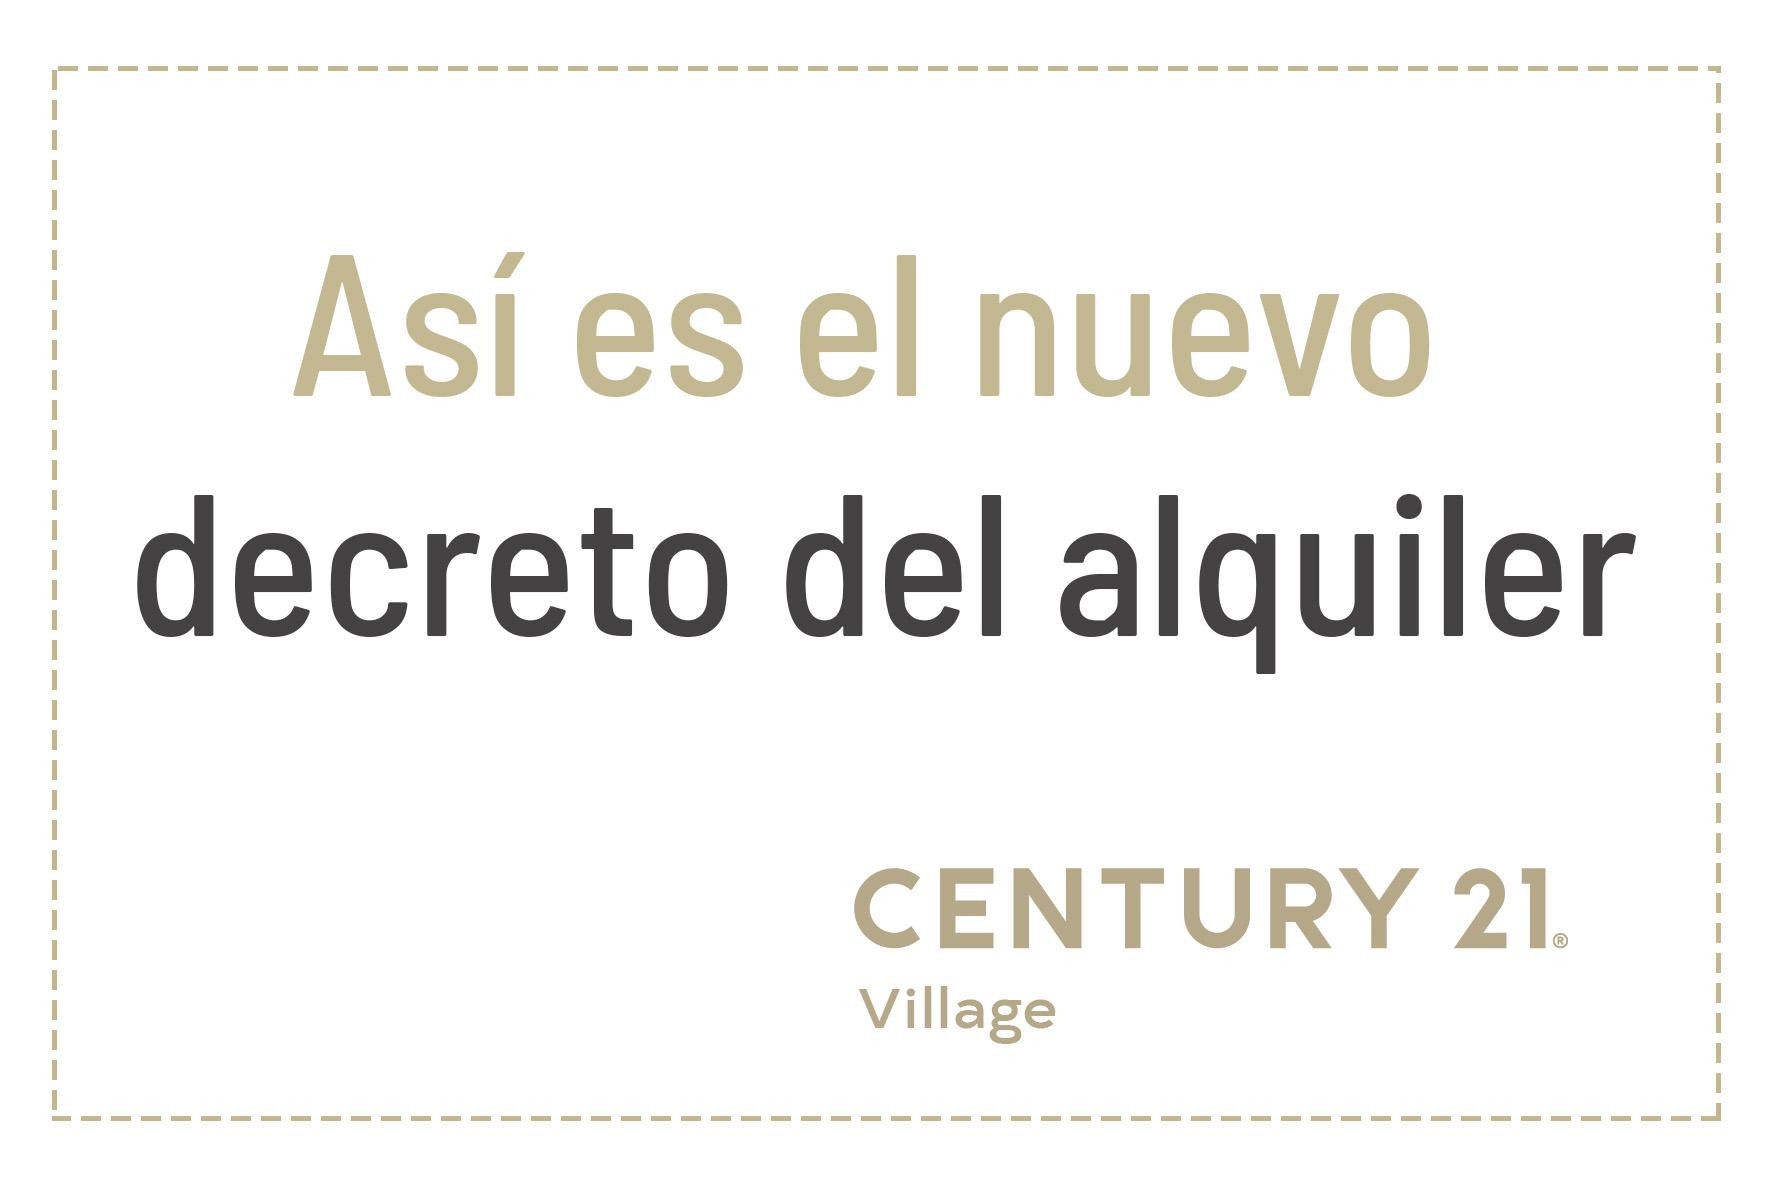 Decreto del alquiler Century 21 Village